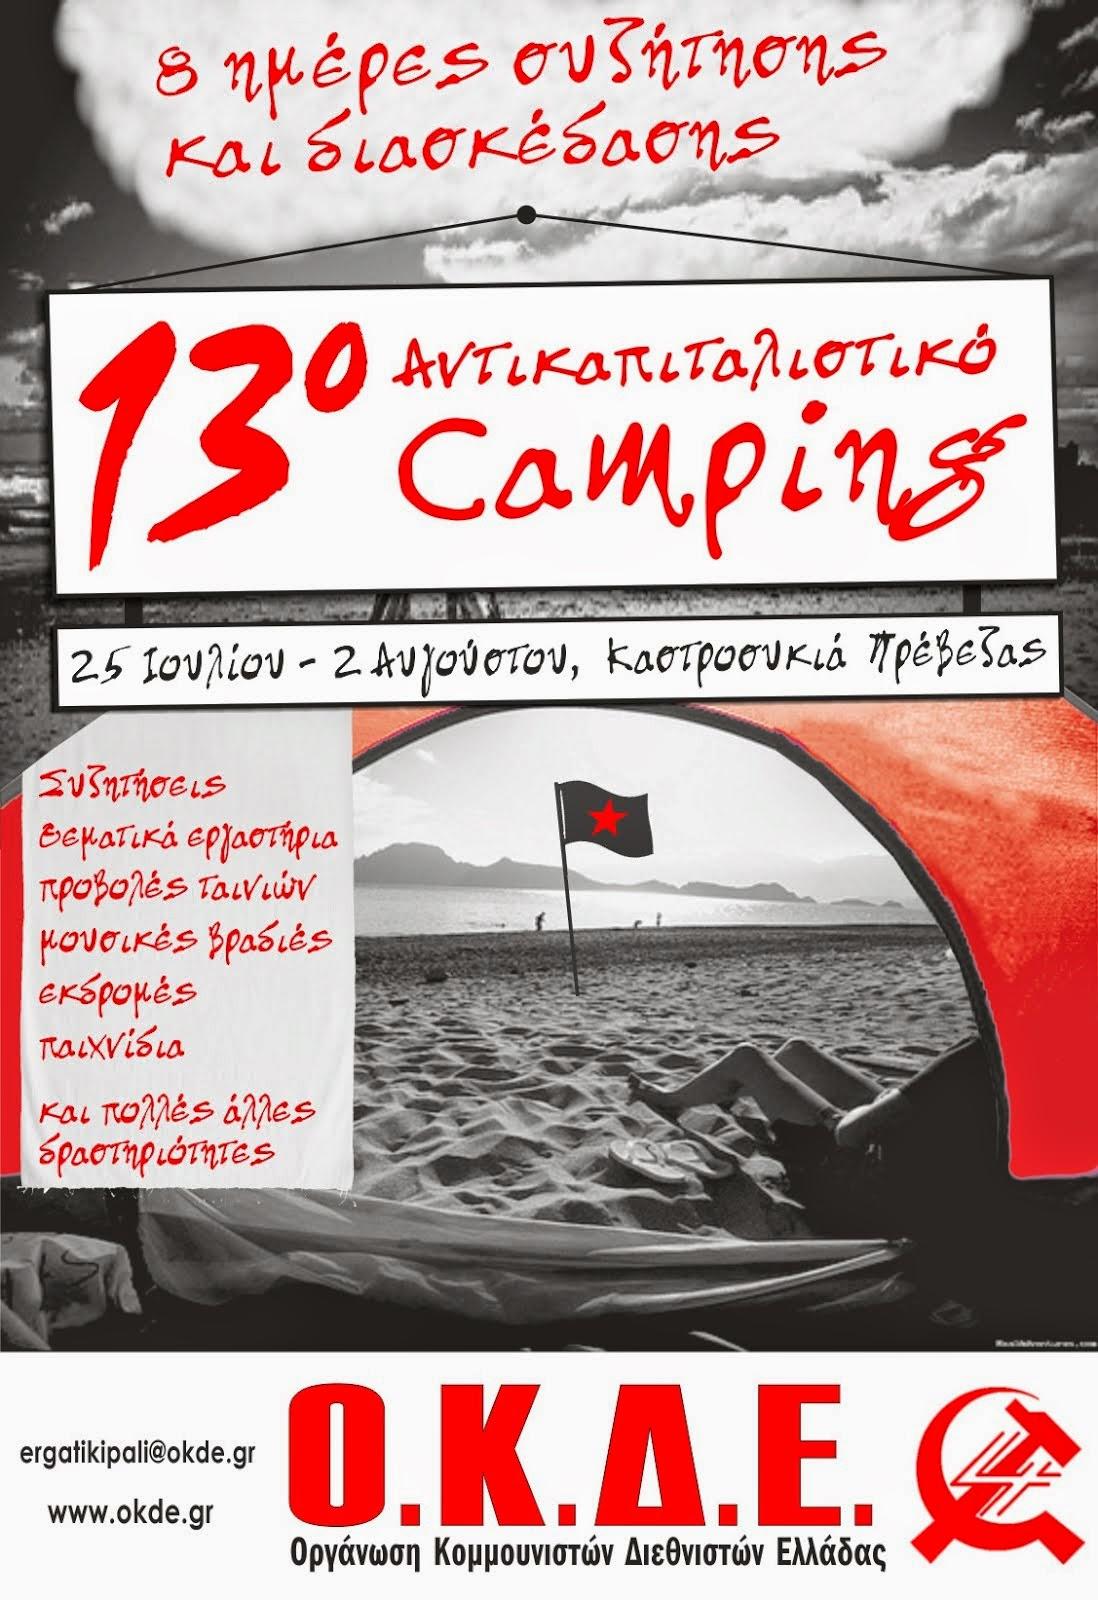 13o Αντικαπιταλιστικό Κάμπινγκ